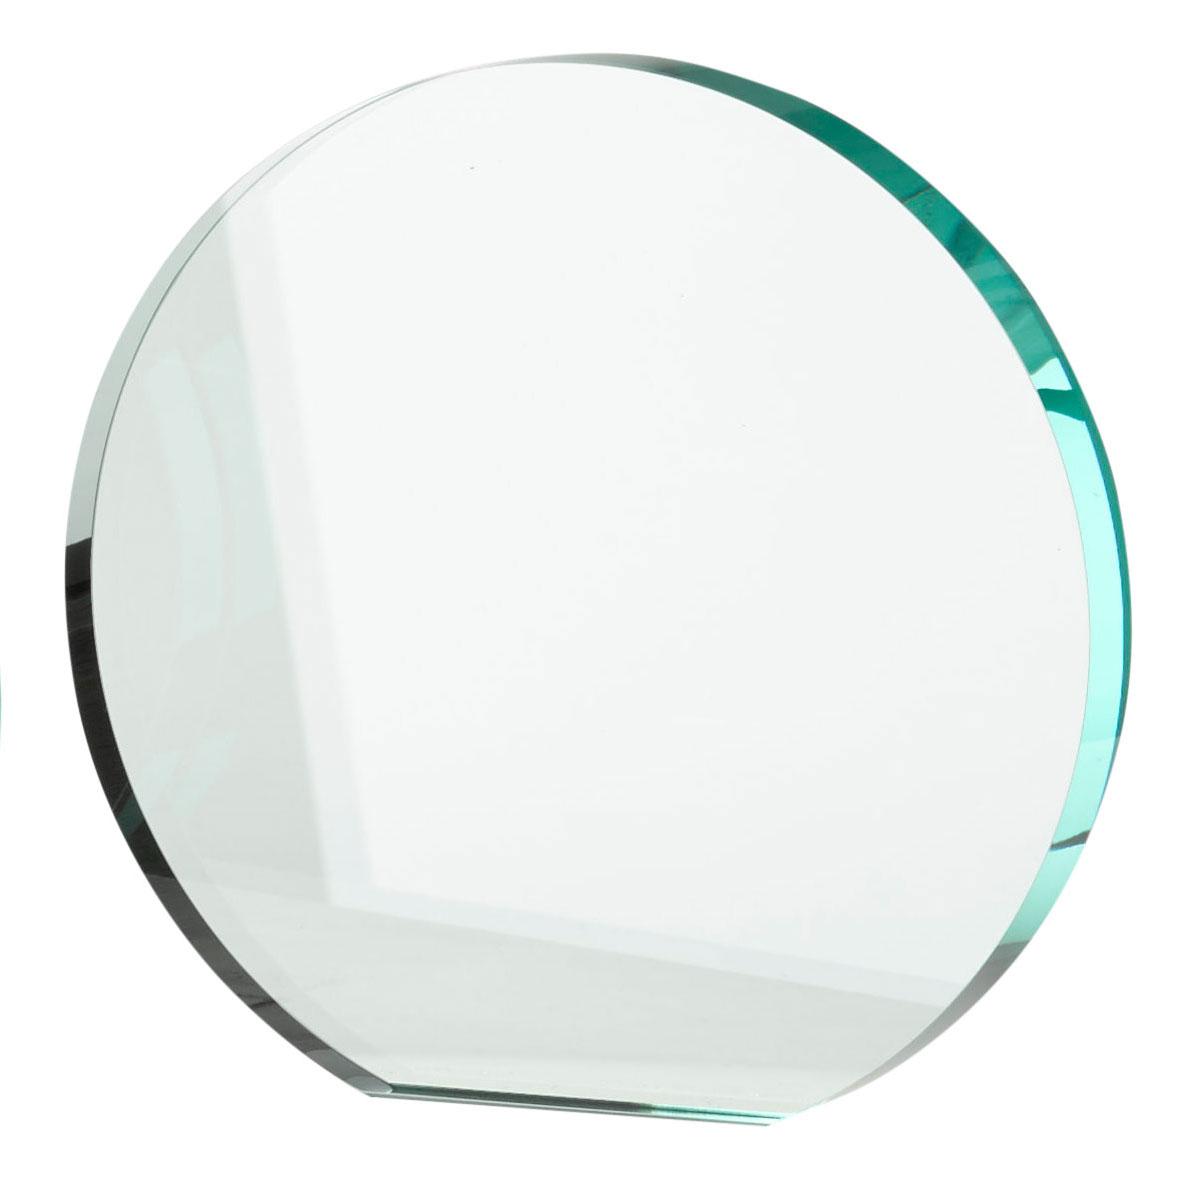 Glas standaard B334   Sportprijzen Vught